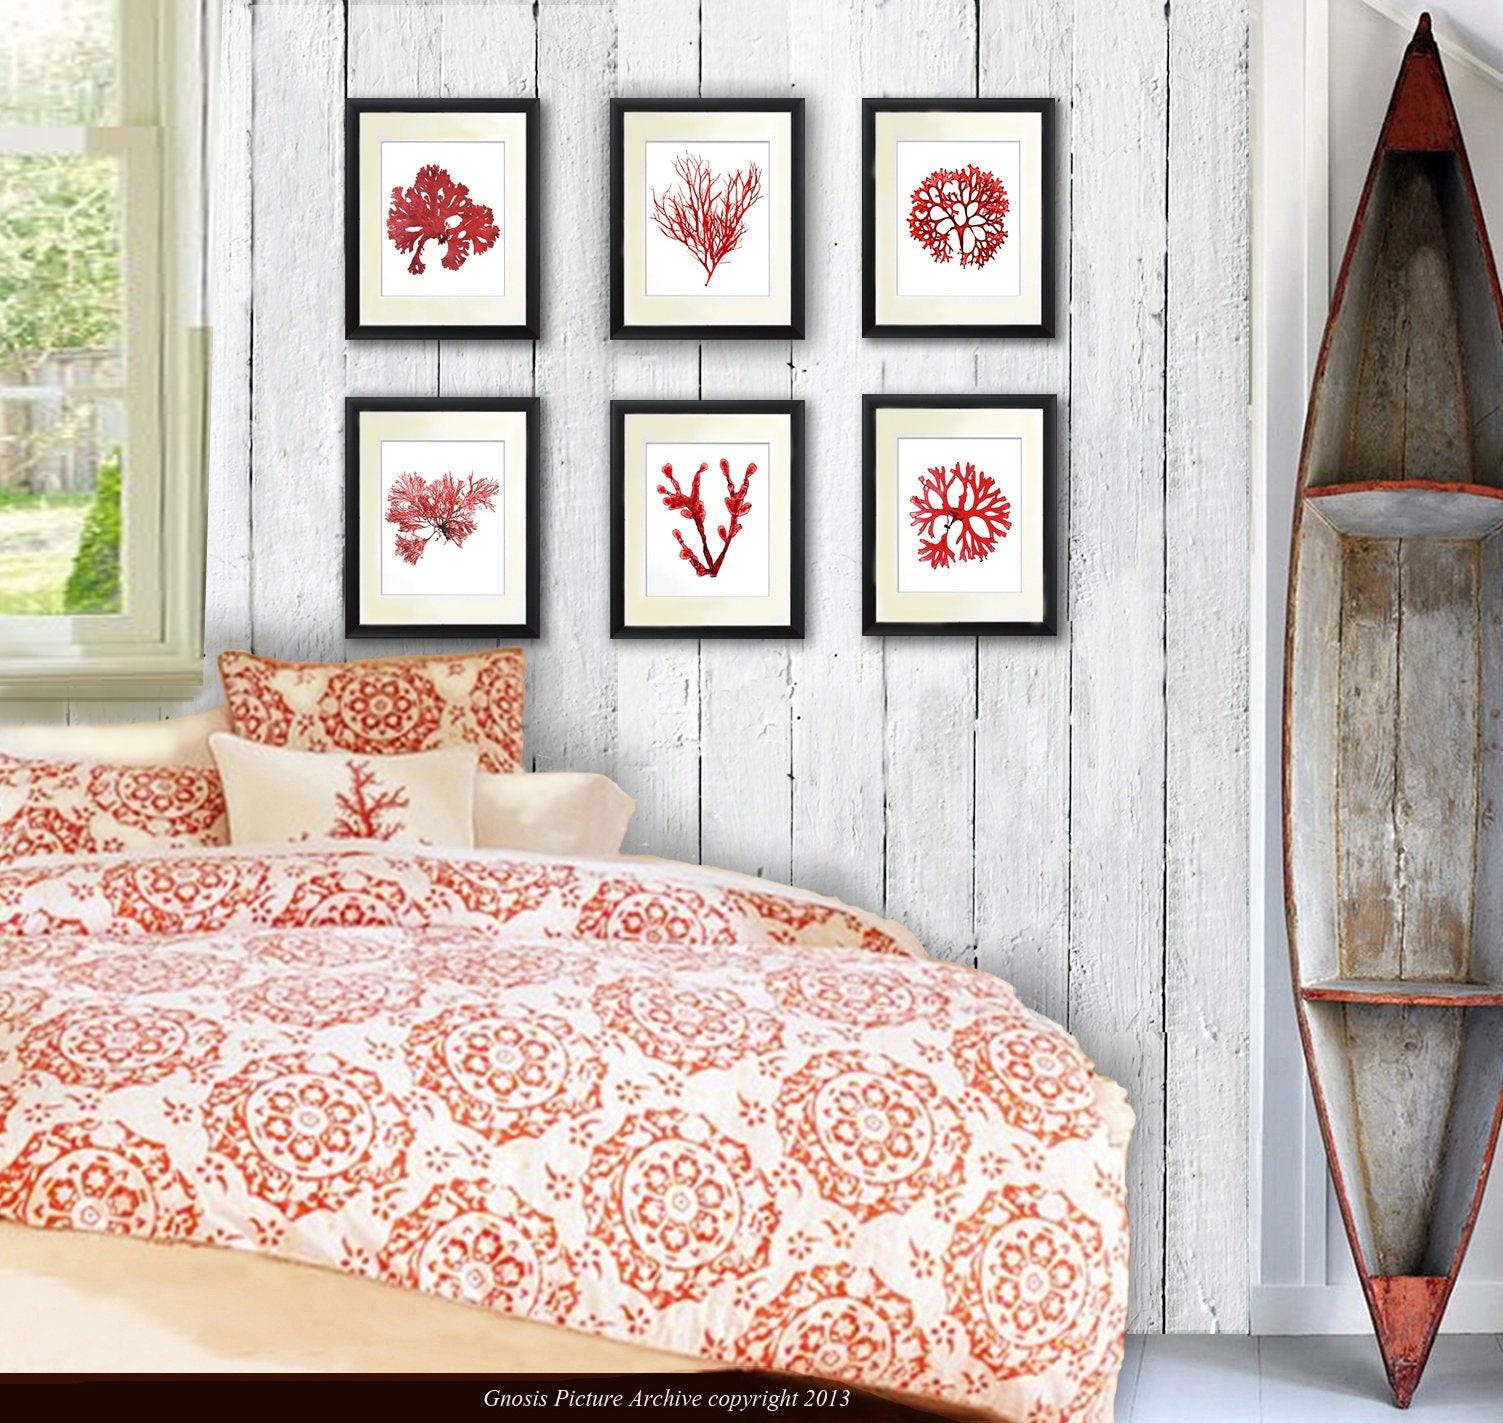 Coastal Wall Decor Coral Red Seaweed Art Prints set of 6